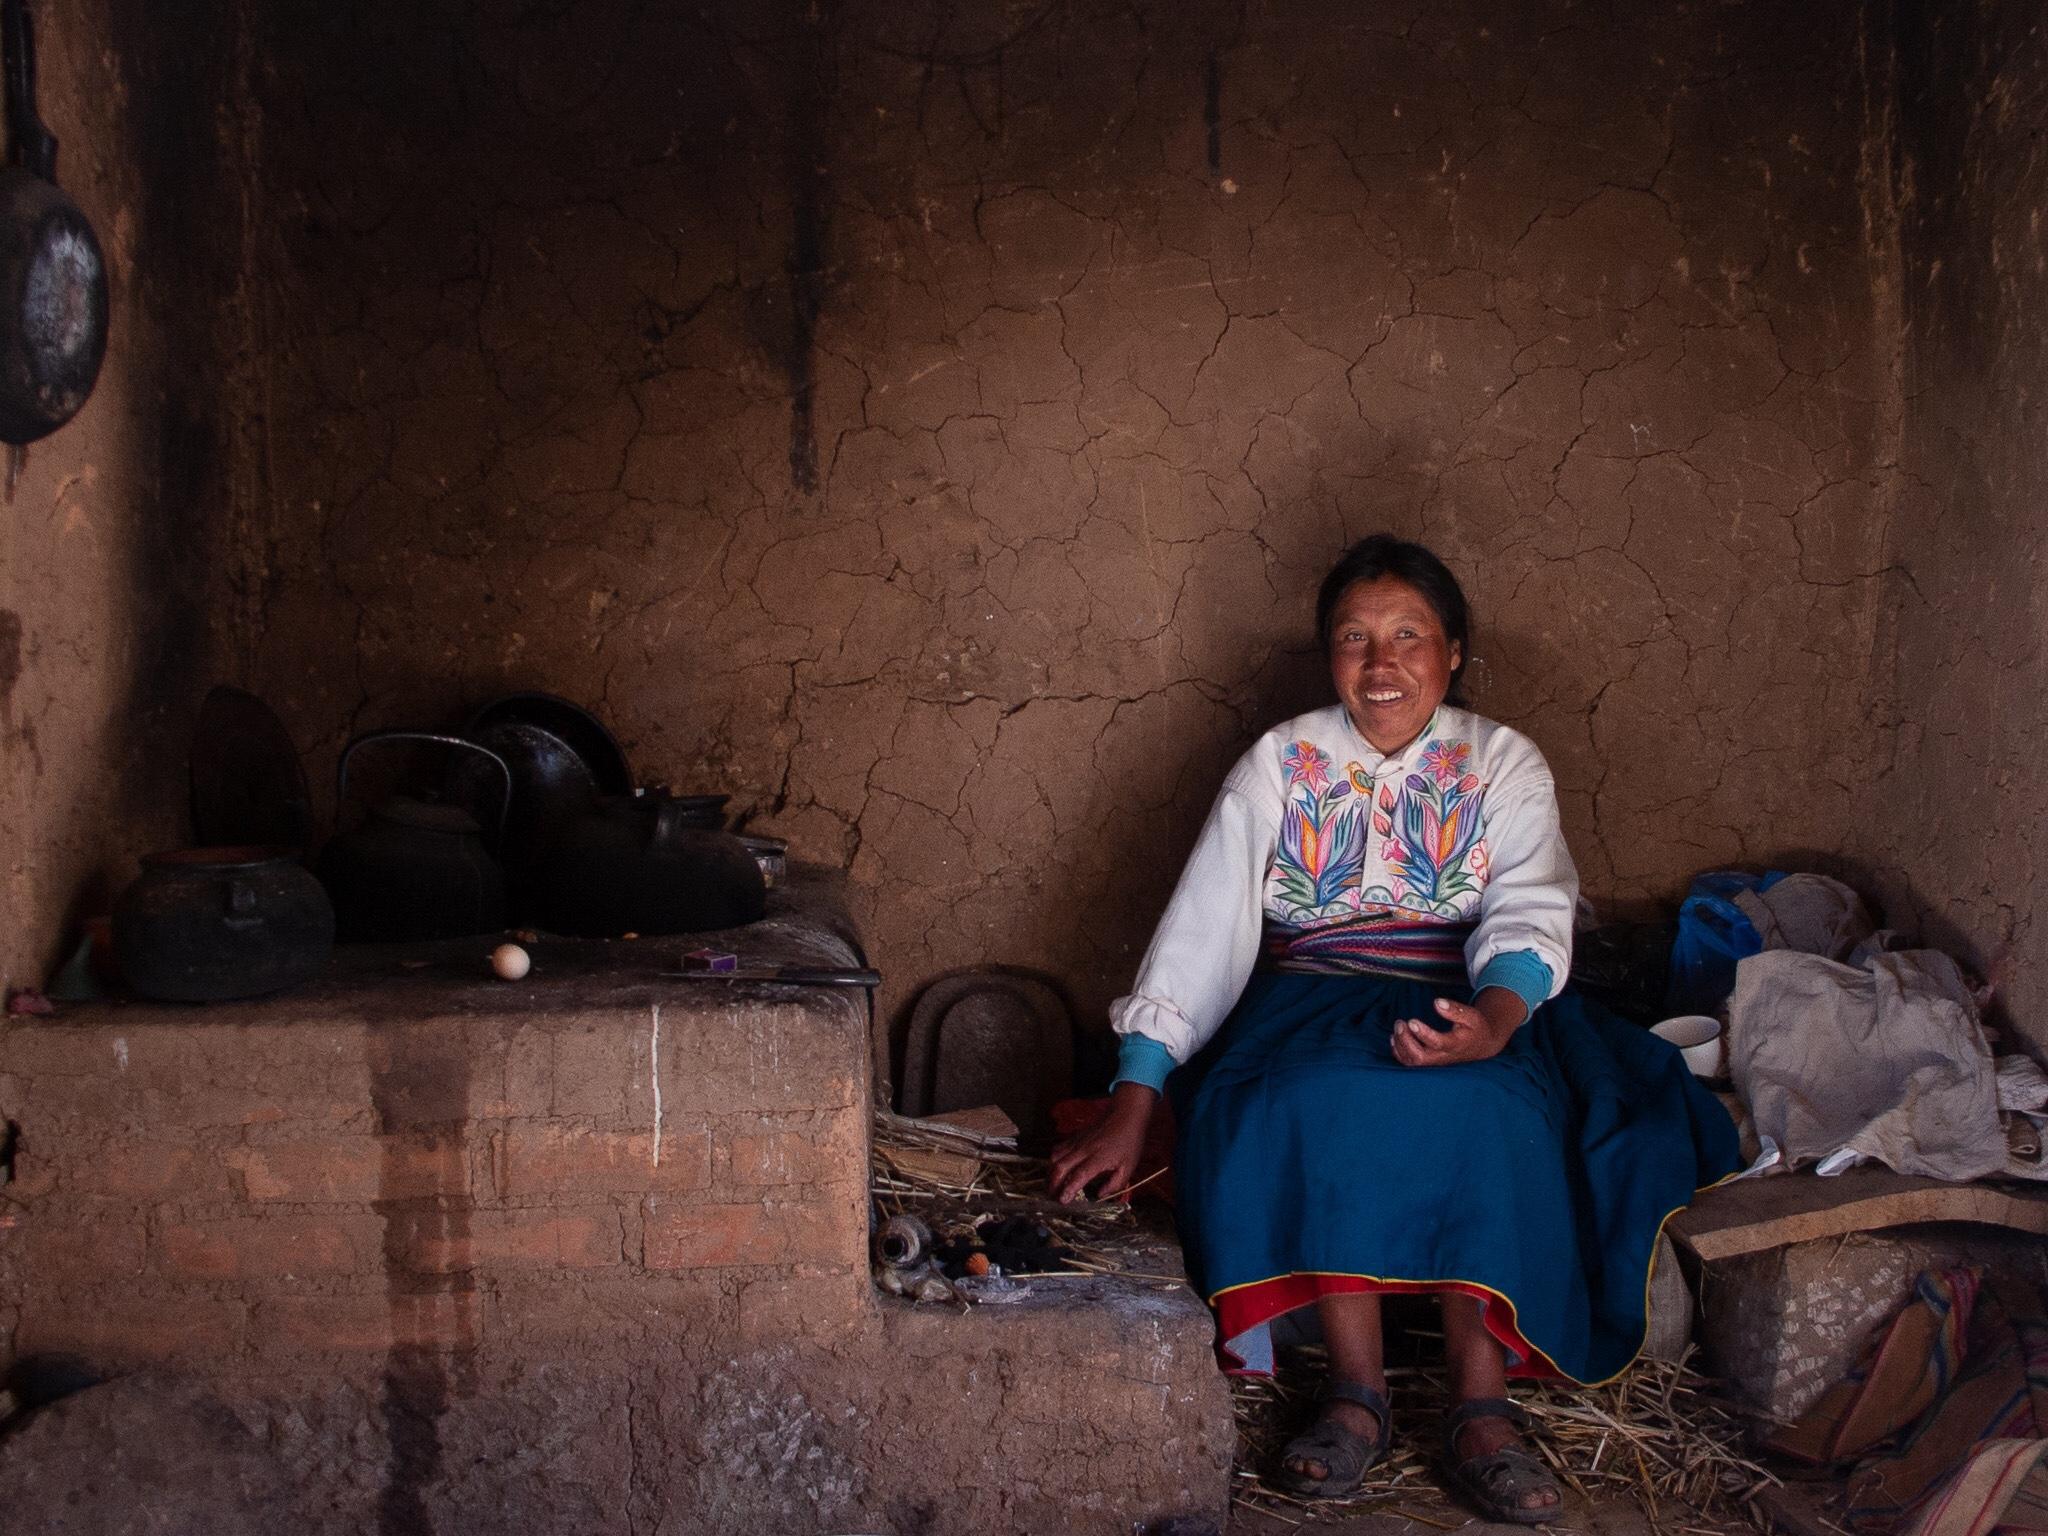 Taquile Island, Lake Titicaca, Perú, 2004